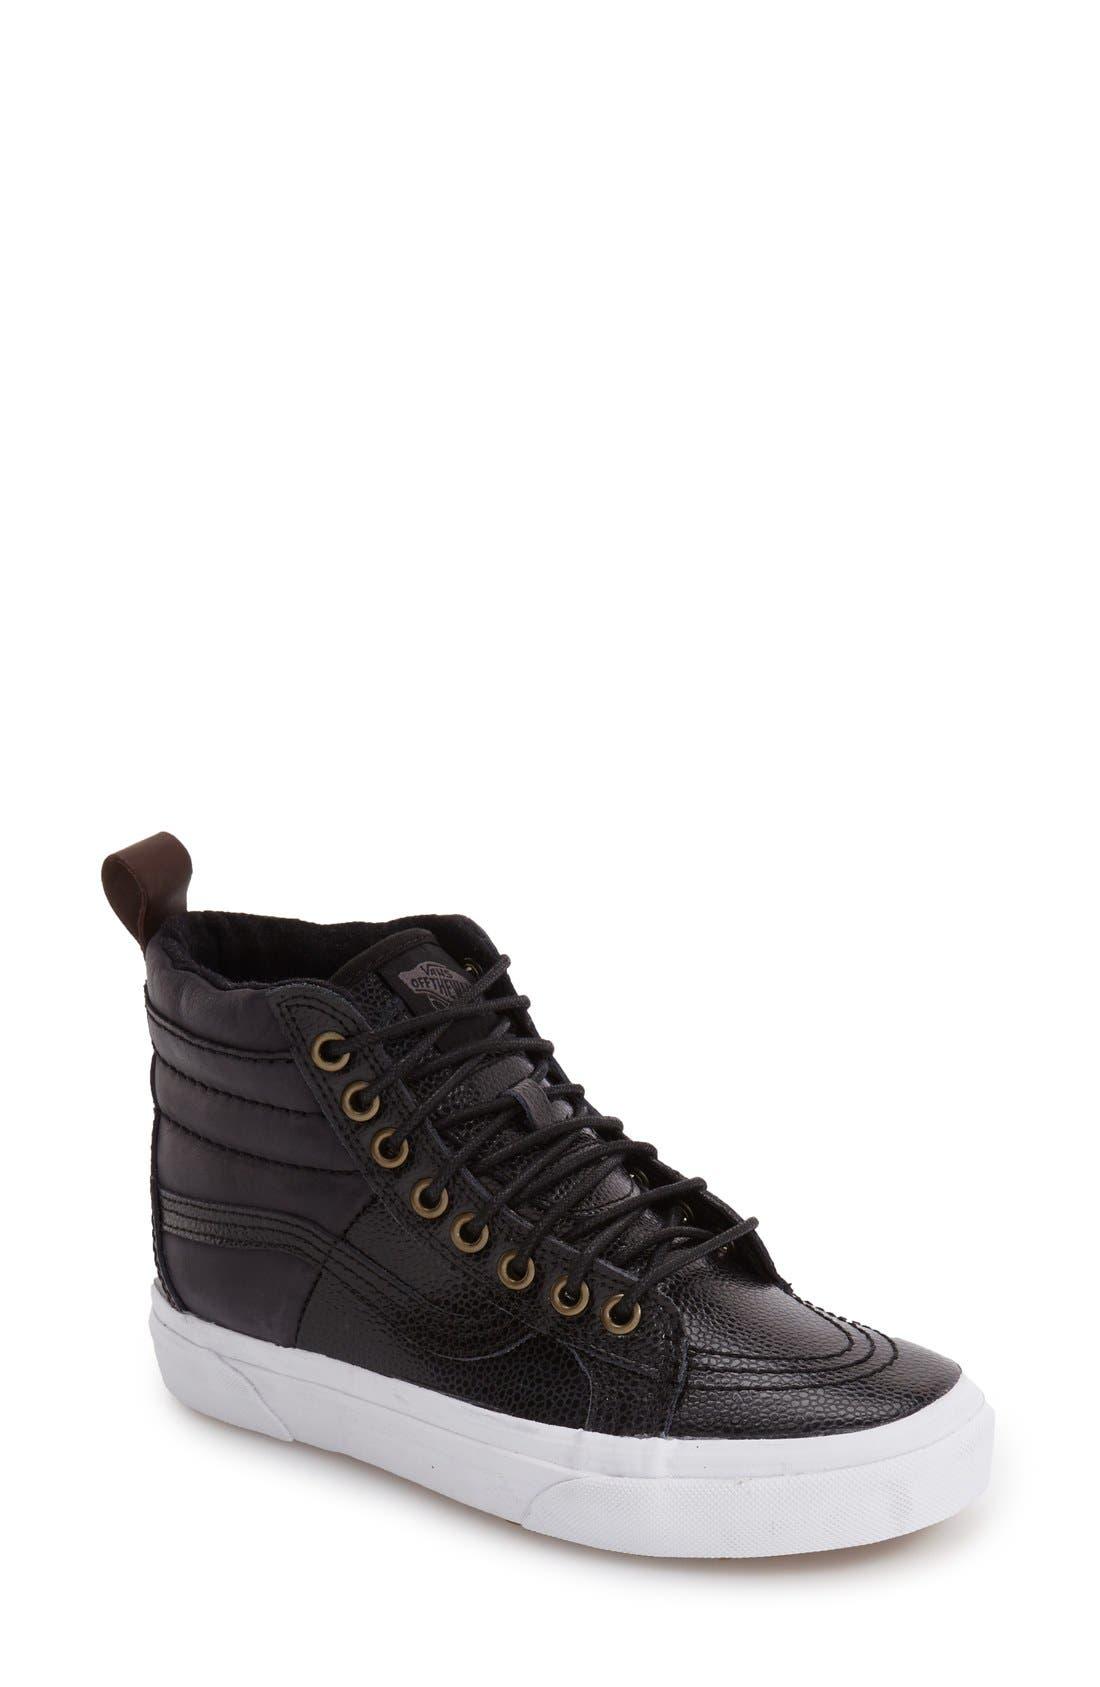 Vans 'Hana Beaman - Sk8-Hi 46 MTE' Water Resistant High Top Sneaker (Women)